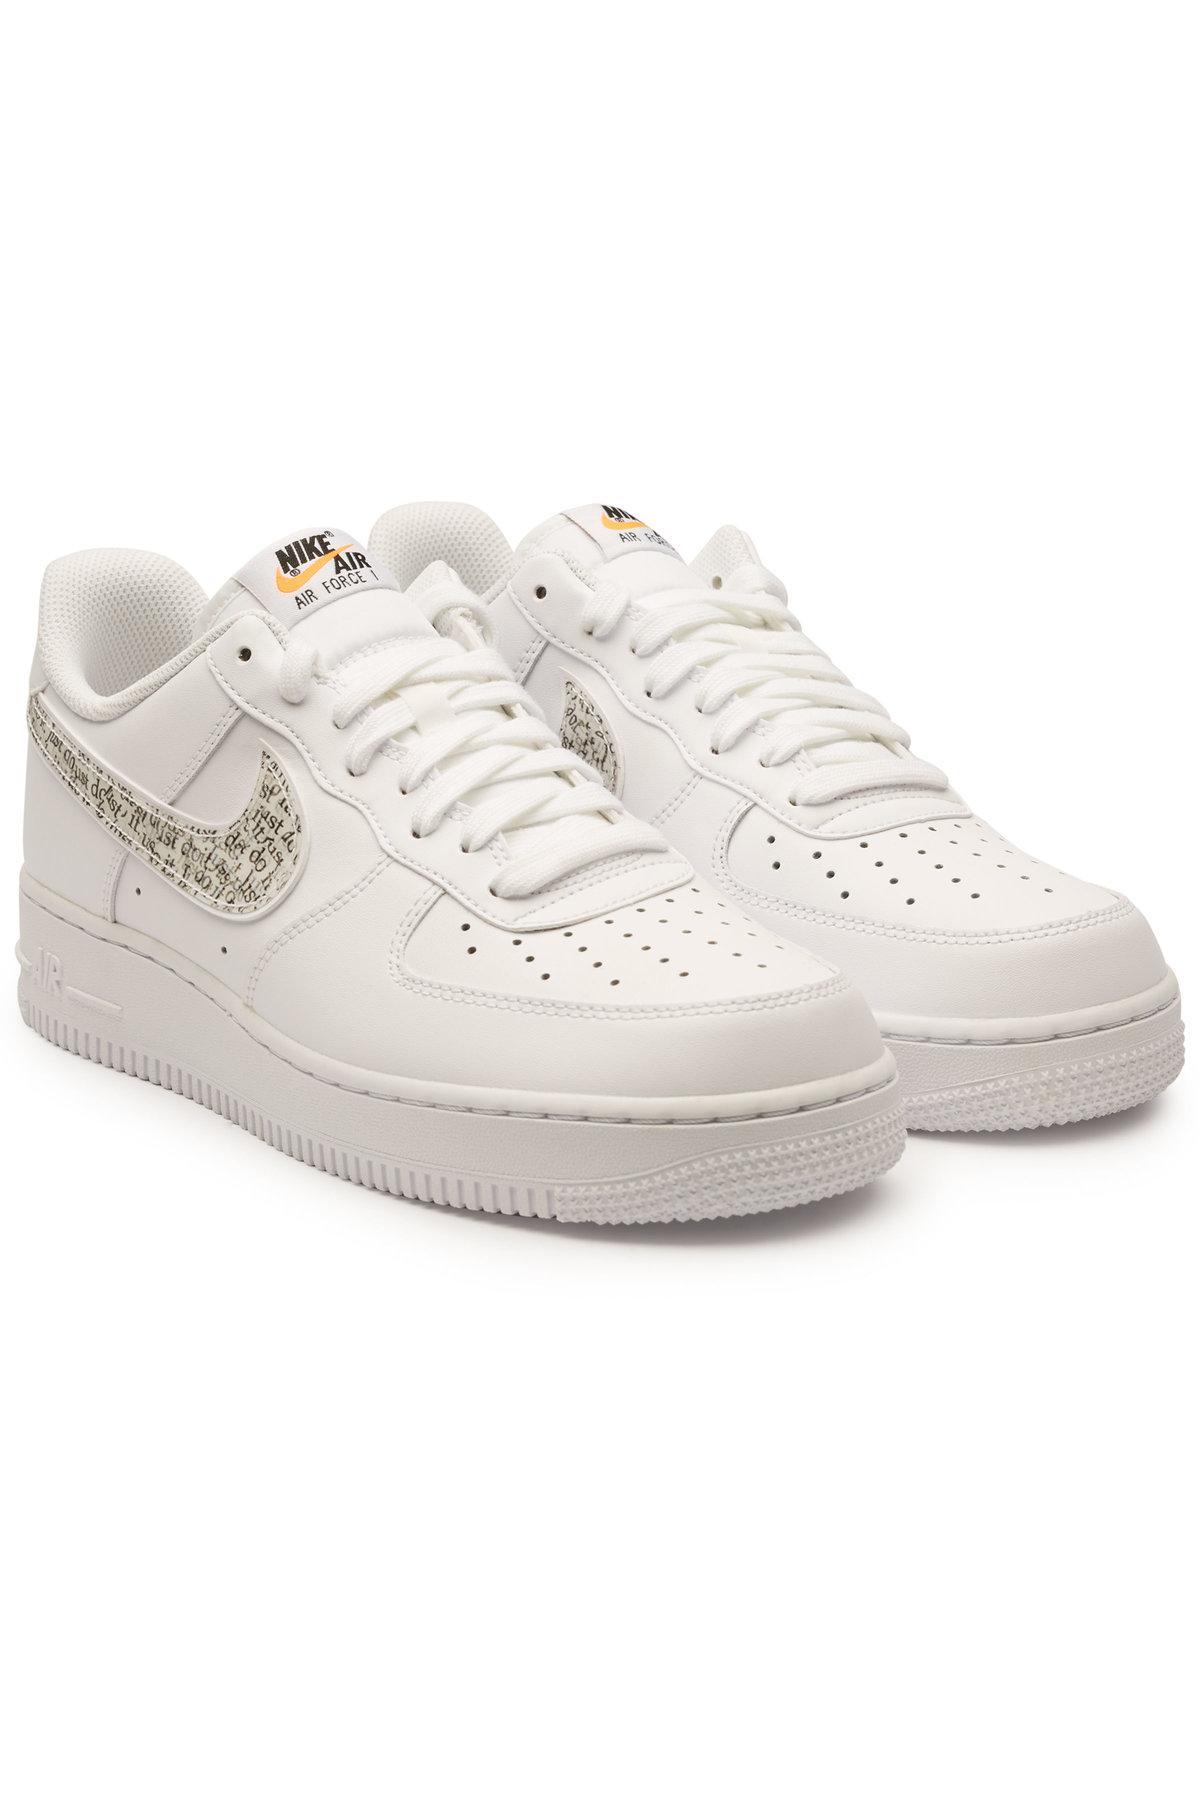 Lyst Nike Air Force 1 '07 Jdi Lntc Pelle Scarpe da